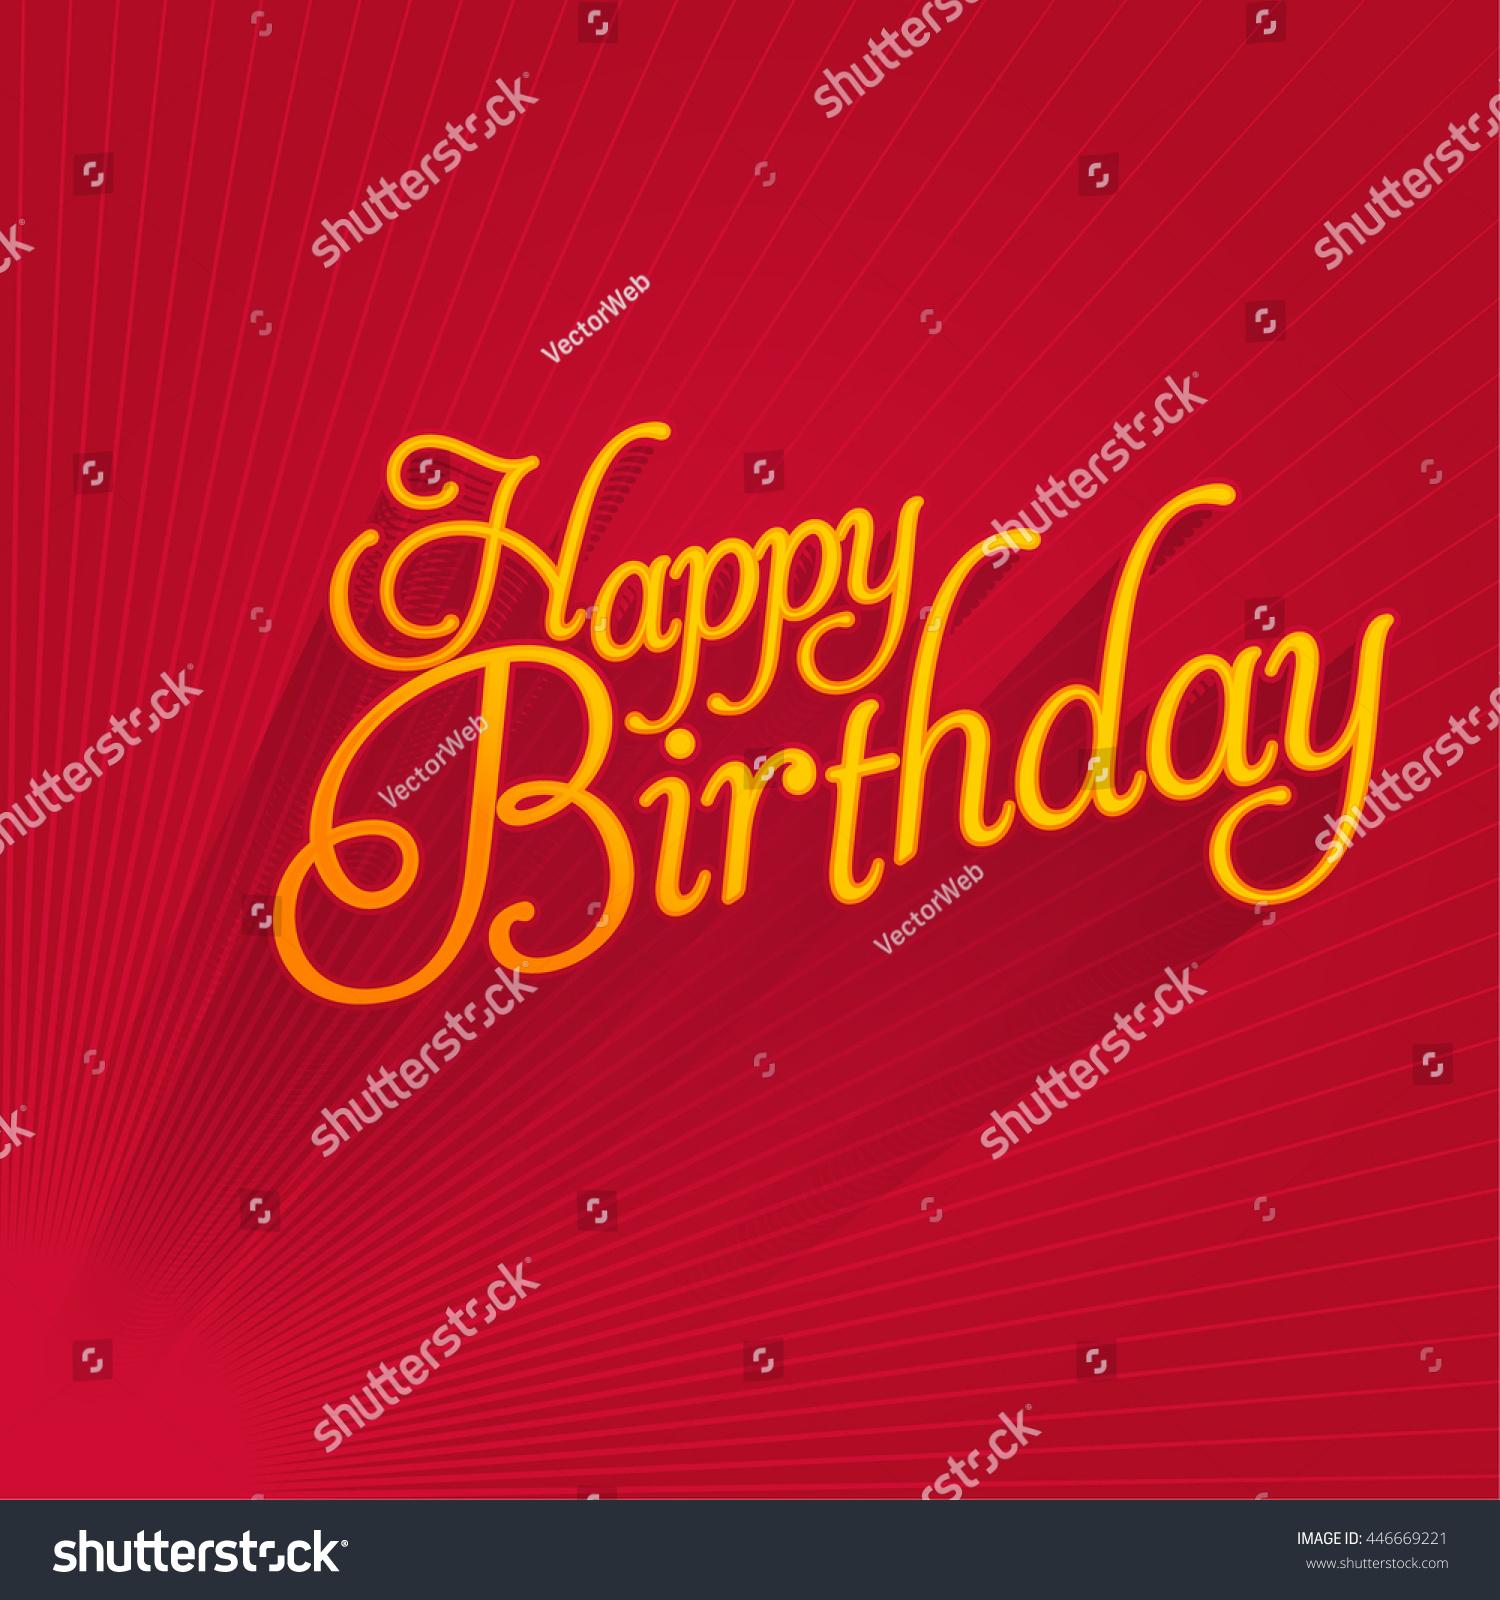 Stylish Text Happy Birthday Message Greeting Stock Vector Royalty